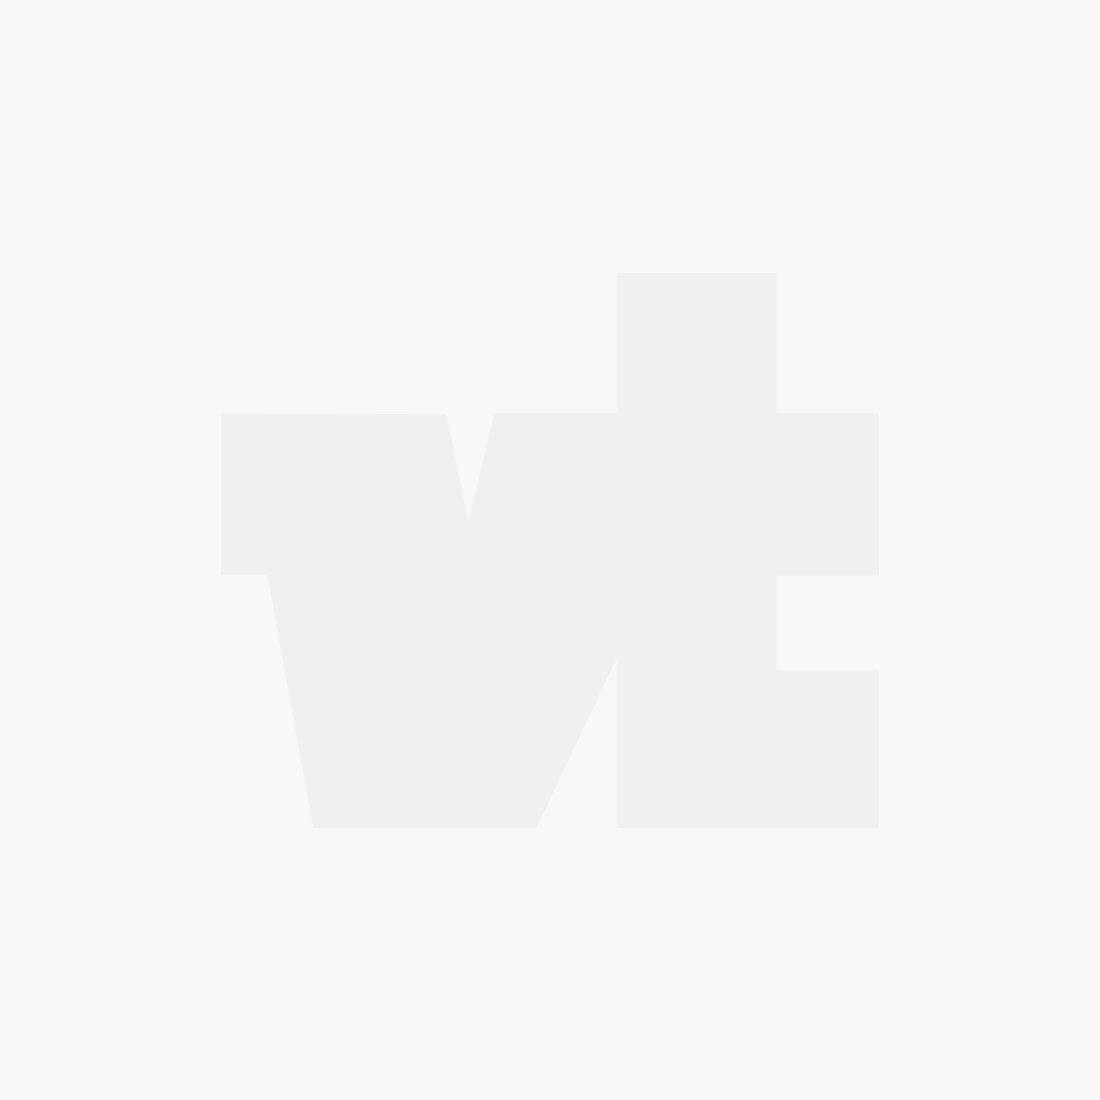 Sneakers w5740 white & mint